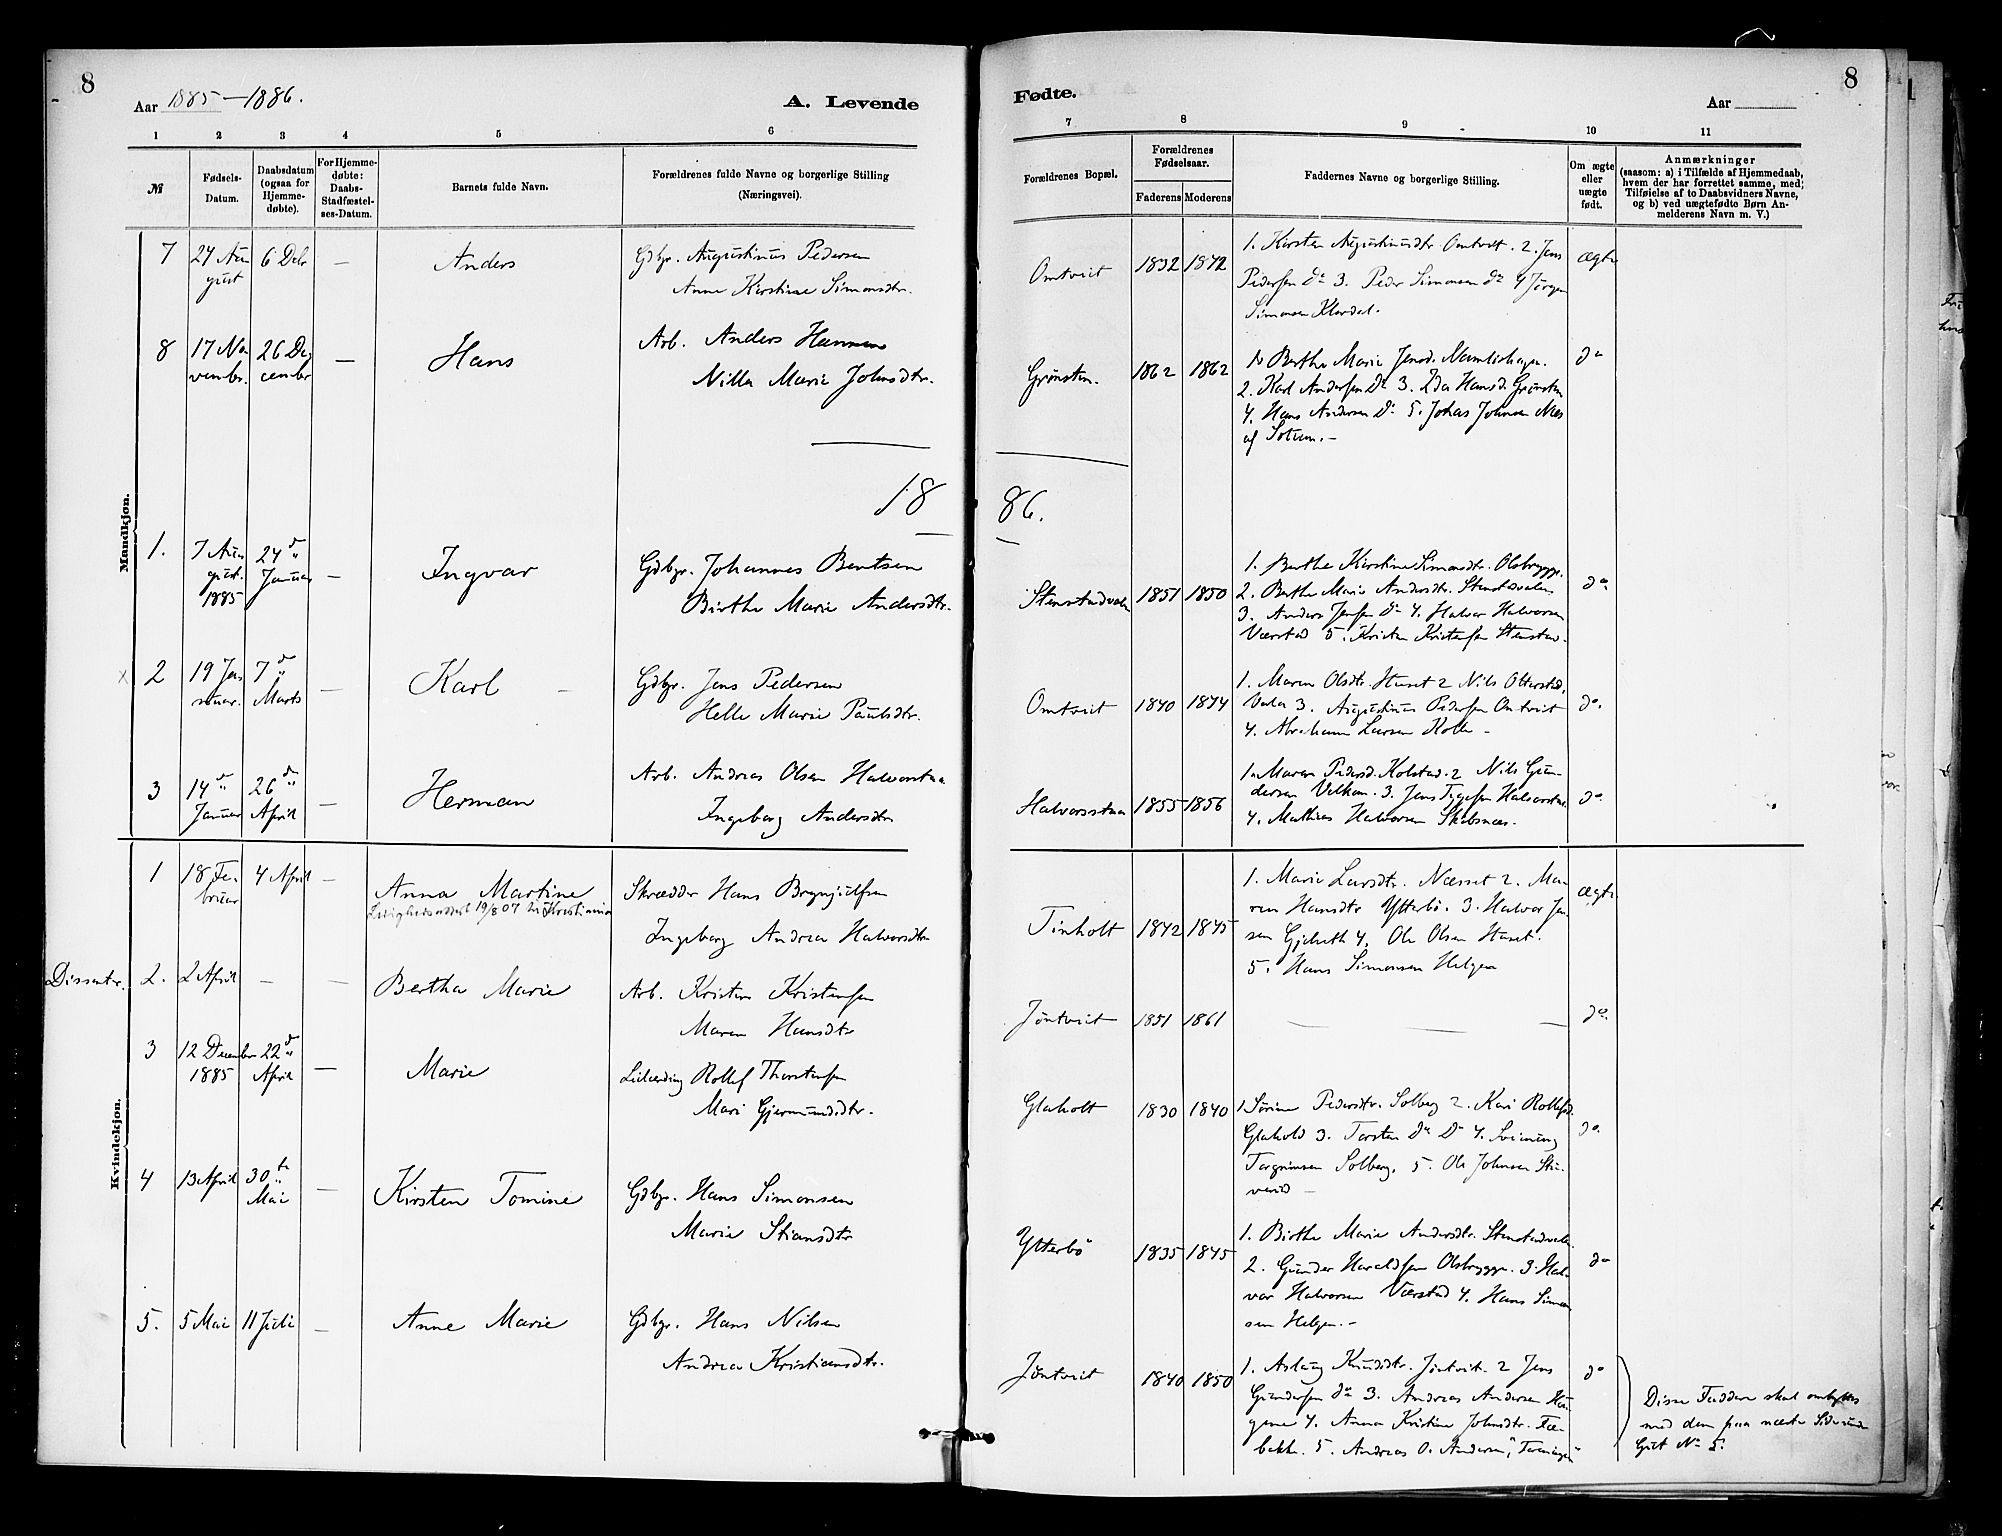 SAKO, Holla kirkebøker, F/Fa/L0009: Ministerialbok nr. 9, 1881-1897, s. 8